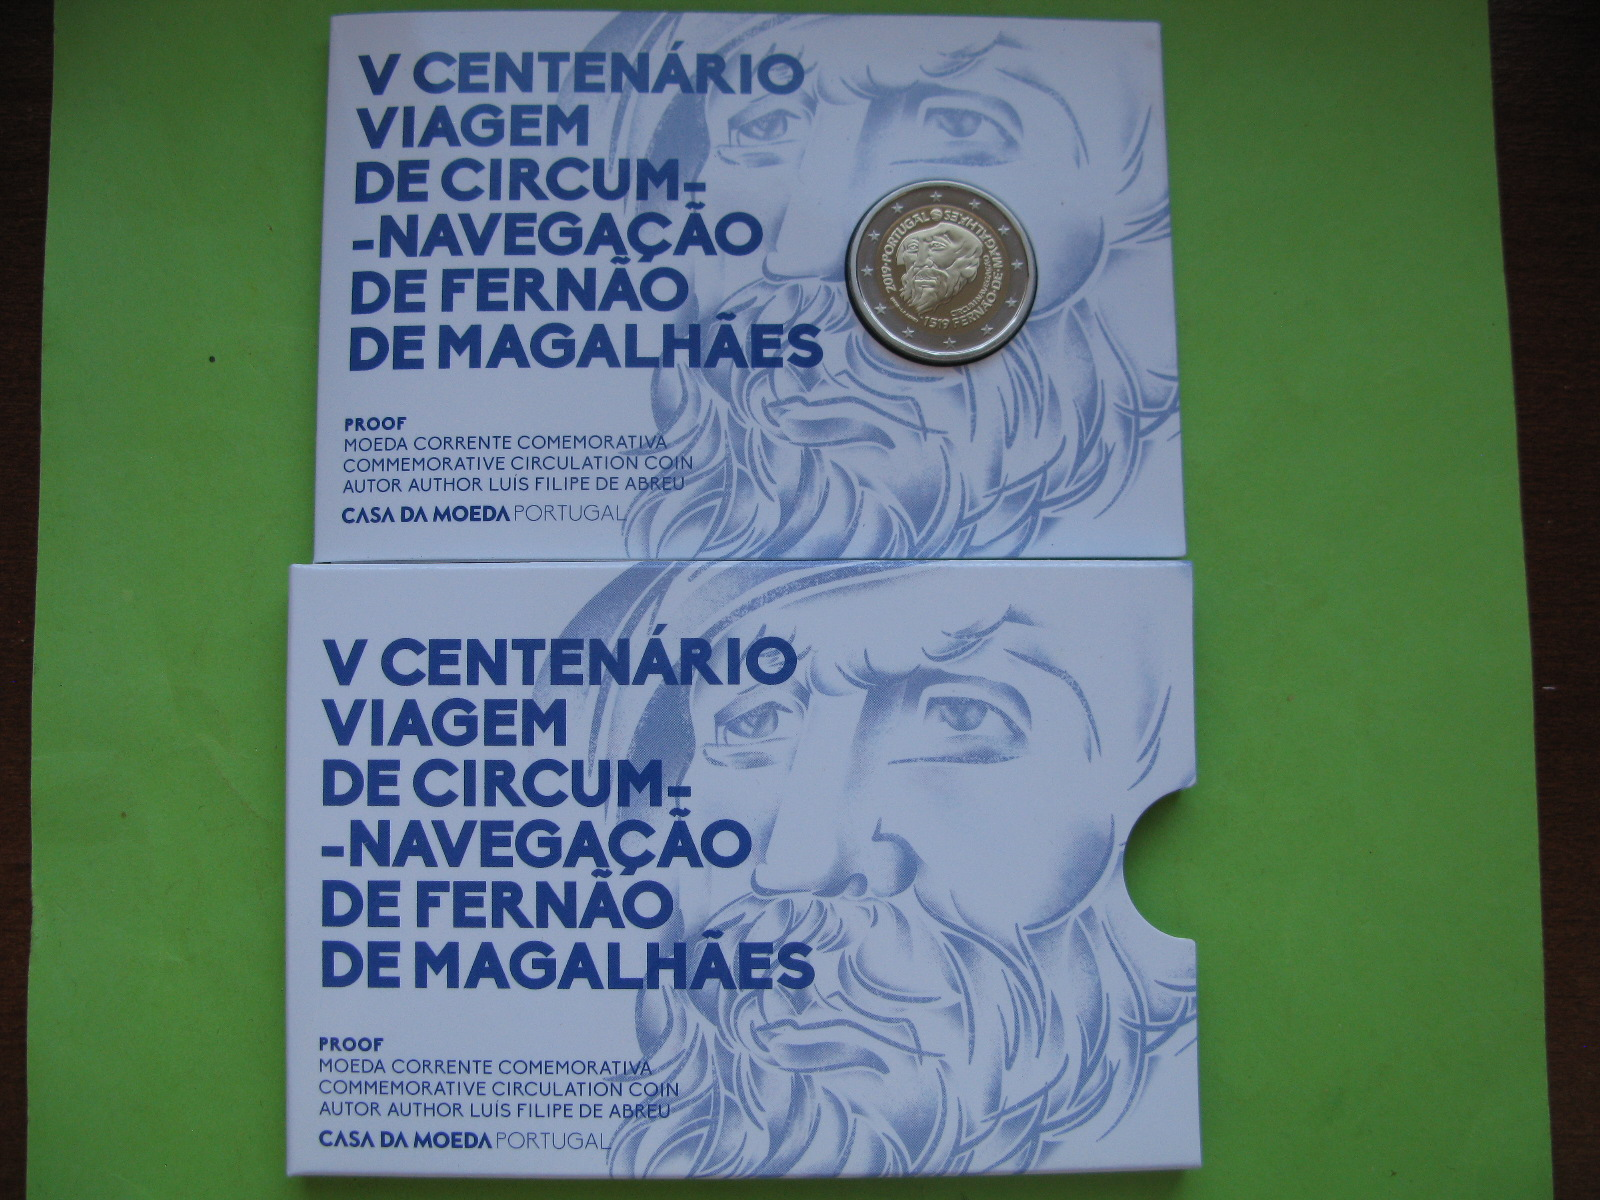 Португалия 2 евро 2019 г. 500-летие кругосветного плавания Магеллана ( пруф)